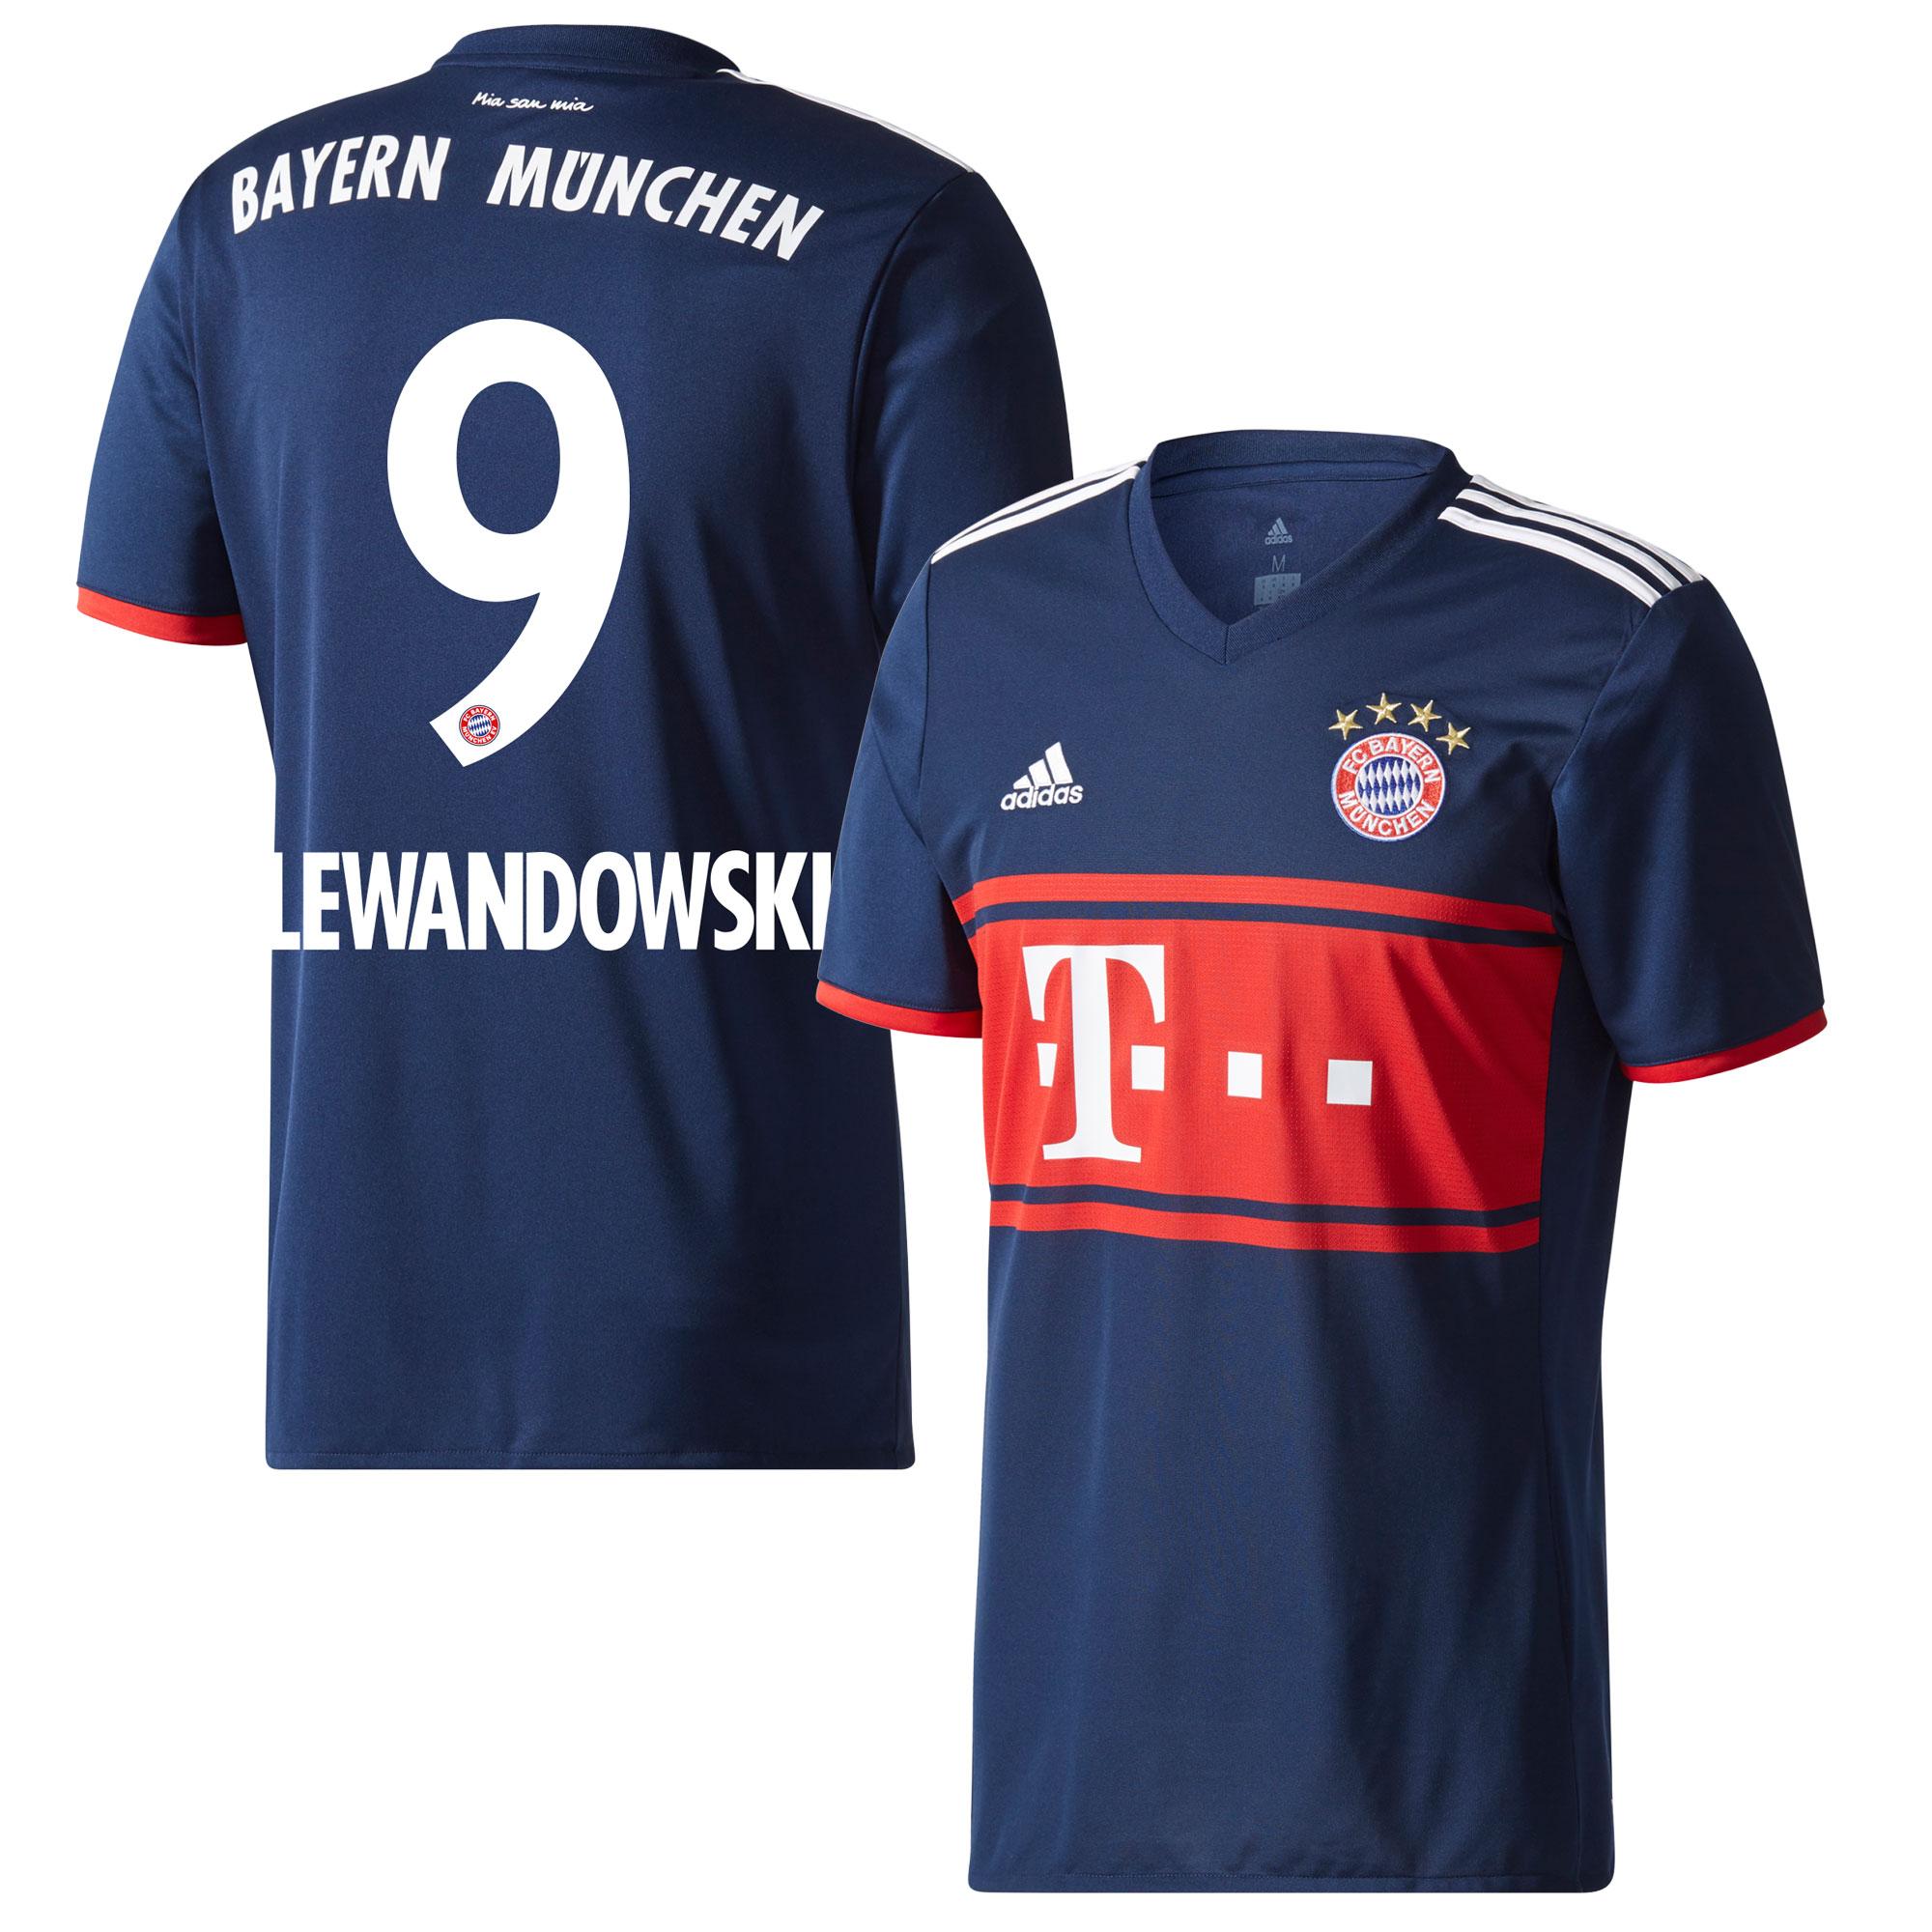 Bayern Munich Away Lewandowski Jersey 2017 / 2018 (Official Printing) - 50